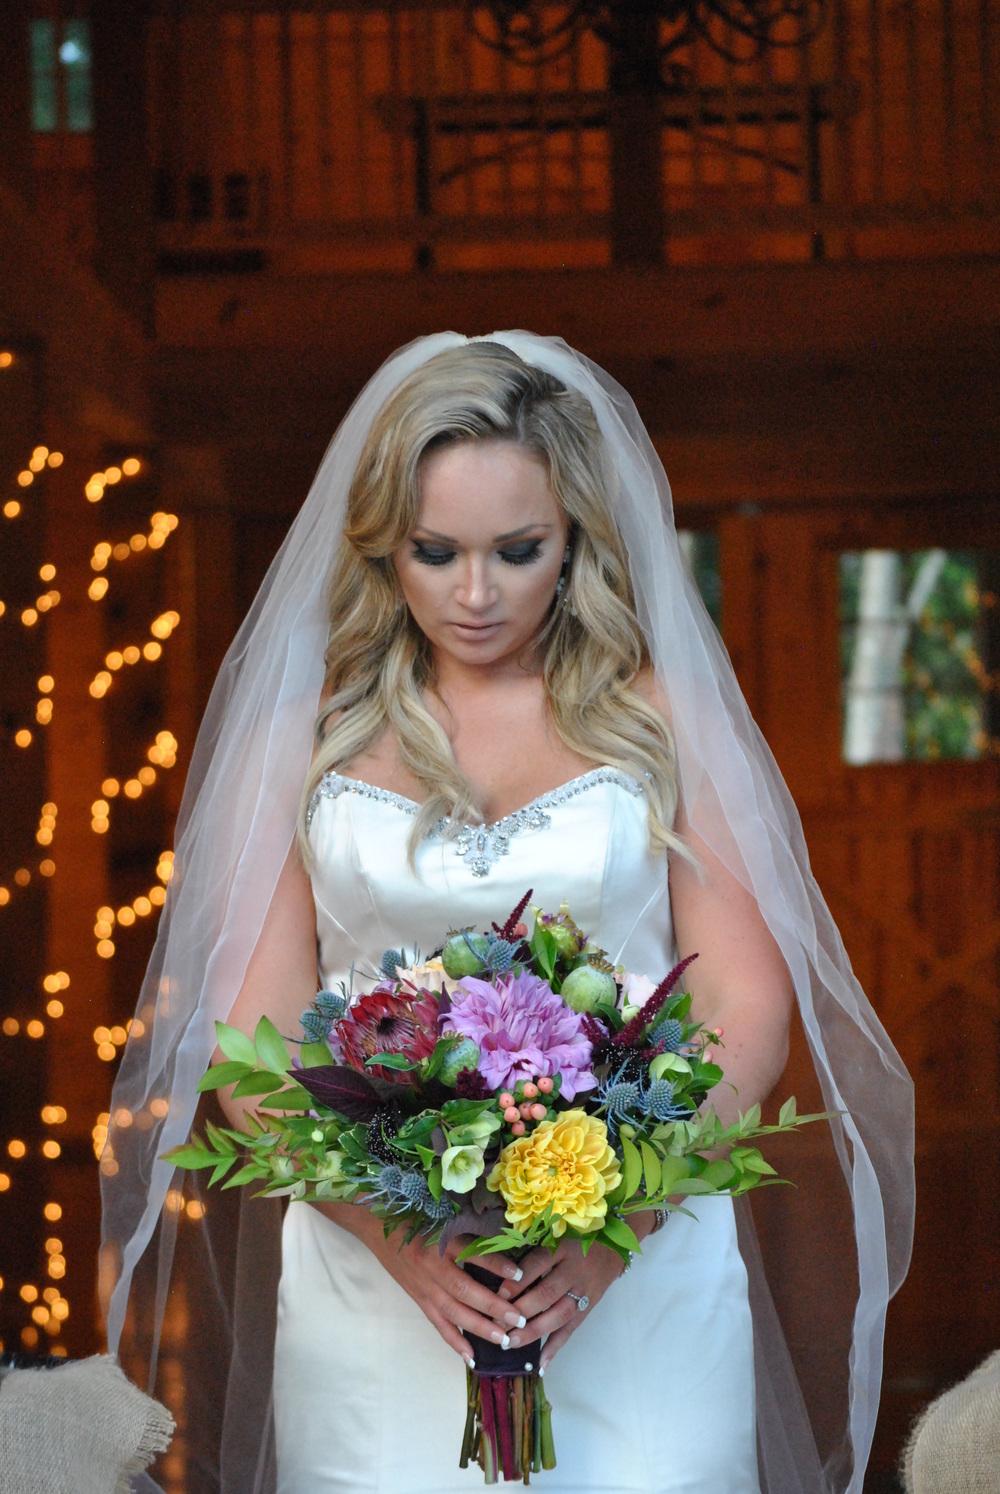 B_PSI_ENTERTAINMENT_WEDDING_BRIDAL_PHOTOGRAPHY_PHOTOGRAPHER_LYNCHBURG_BEDFORD_SIERRA_VISTA12